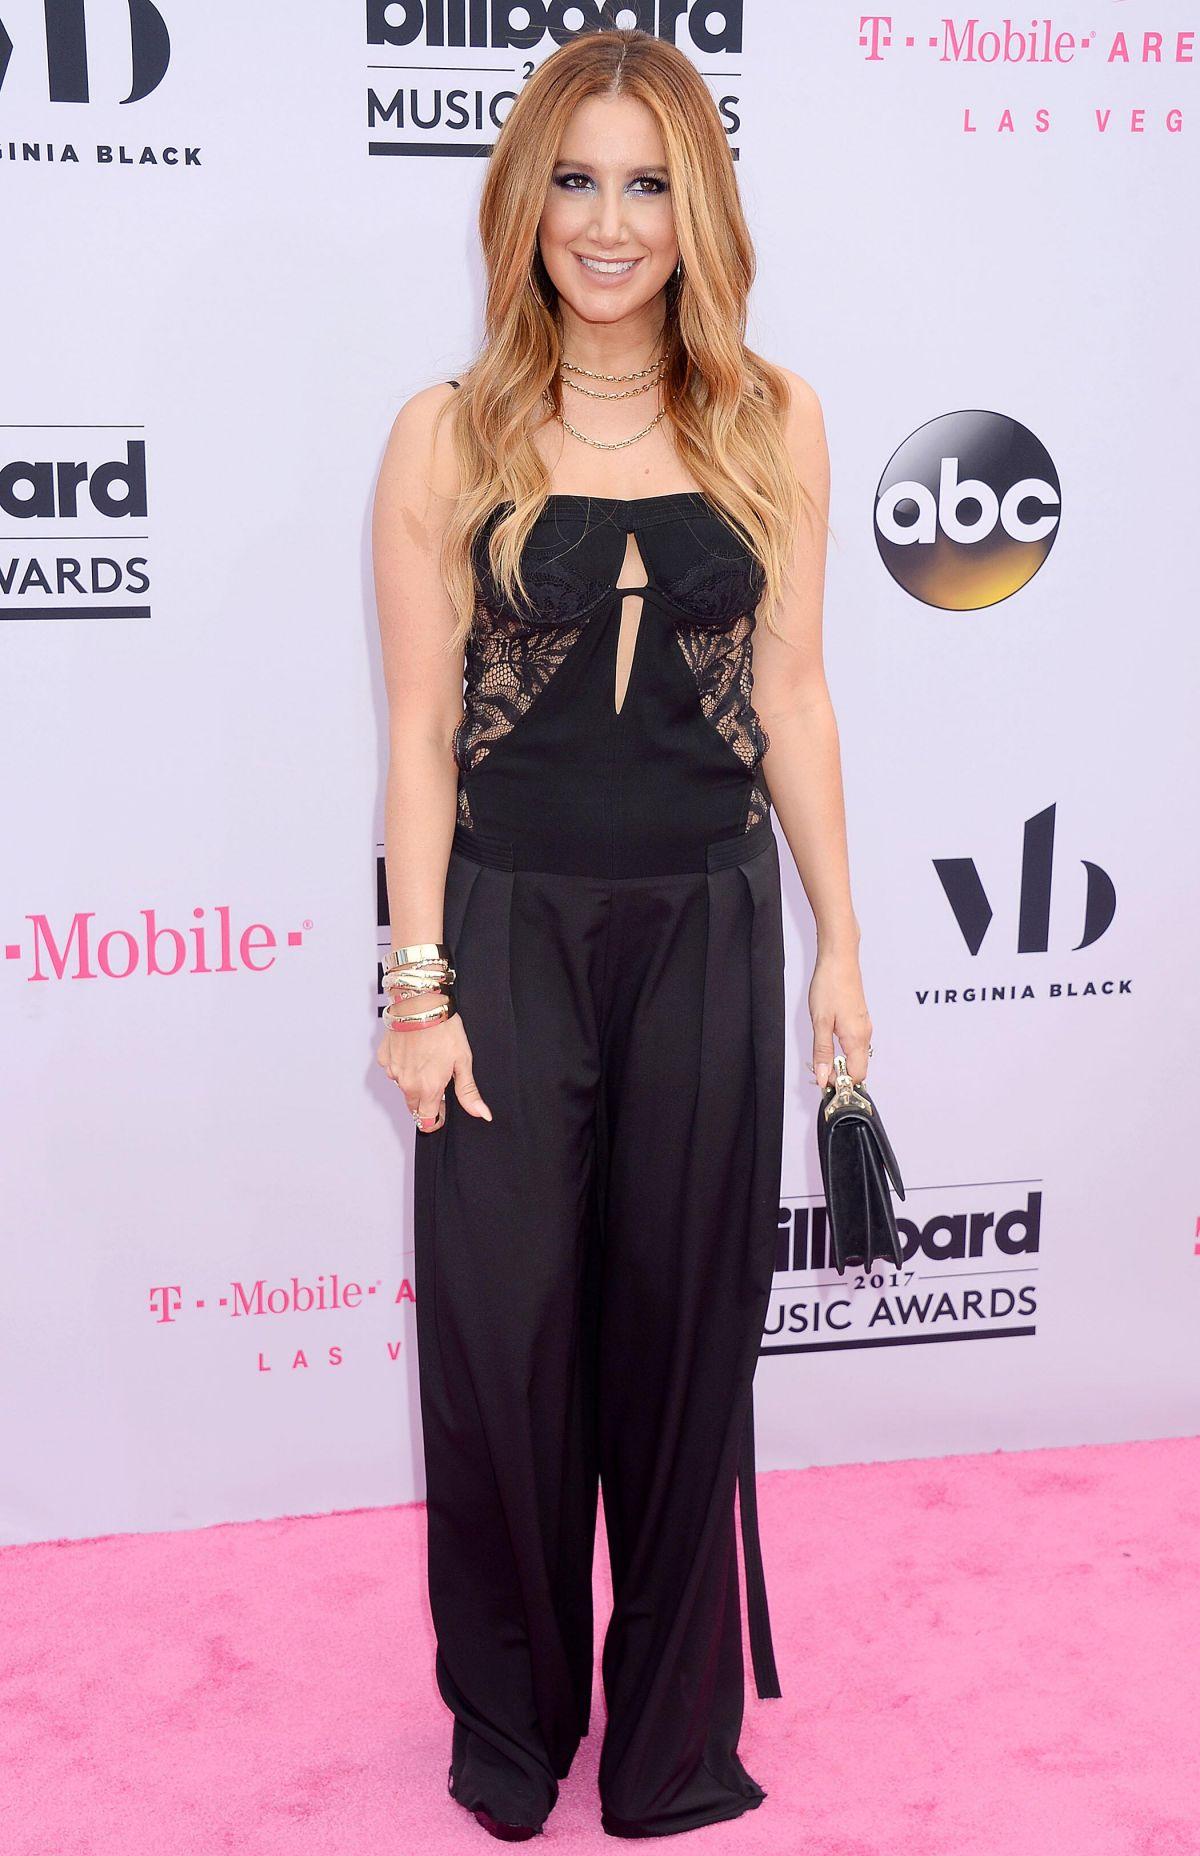 ASHLEY TISDALE at Billboard Music Awards 2017 in Las Vegas 05/21/2017 - HawtCelebs